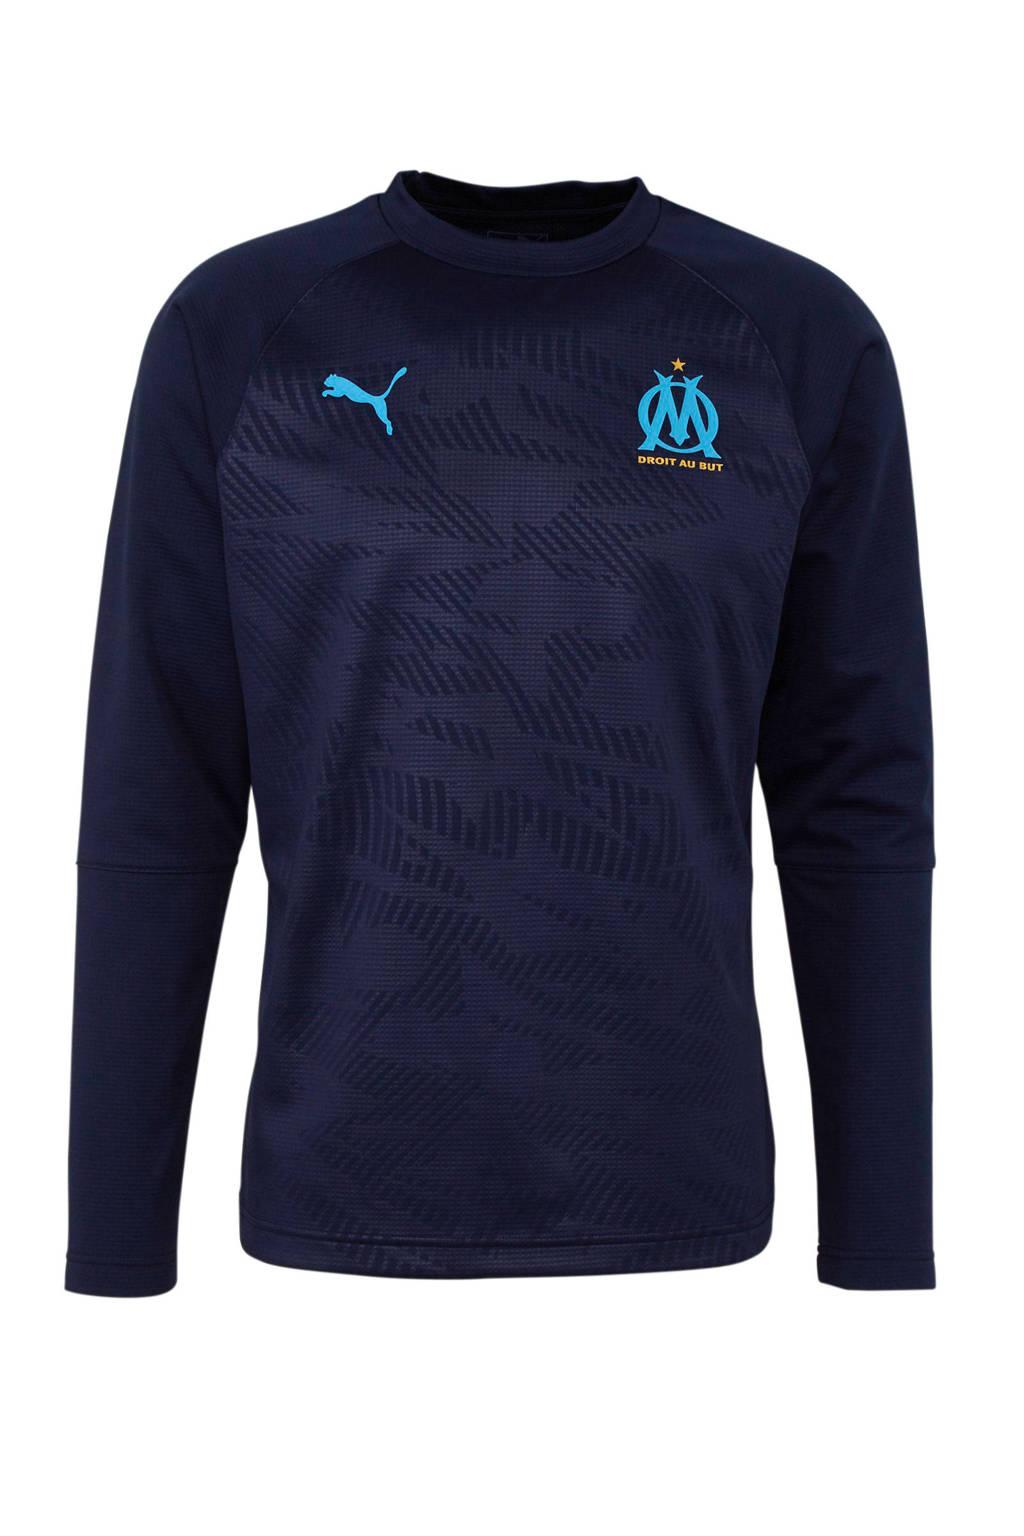 Puma Senior Olympique Marseille voetbalsweater donkerblauw, Donkerblauw